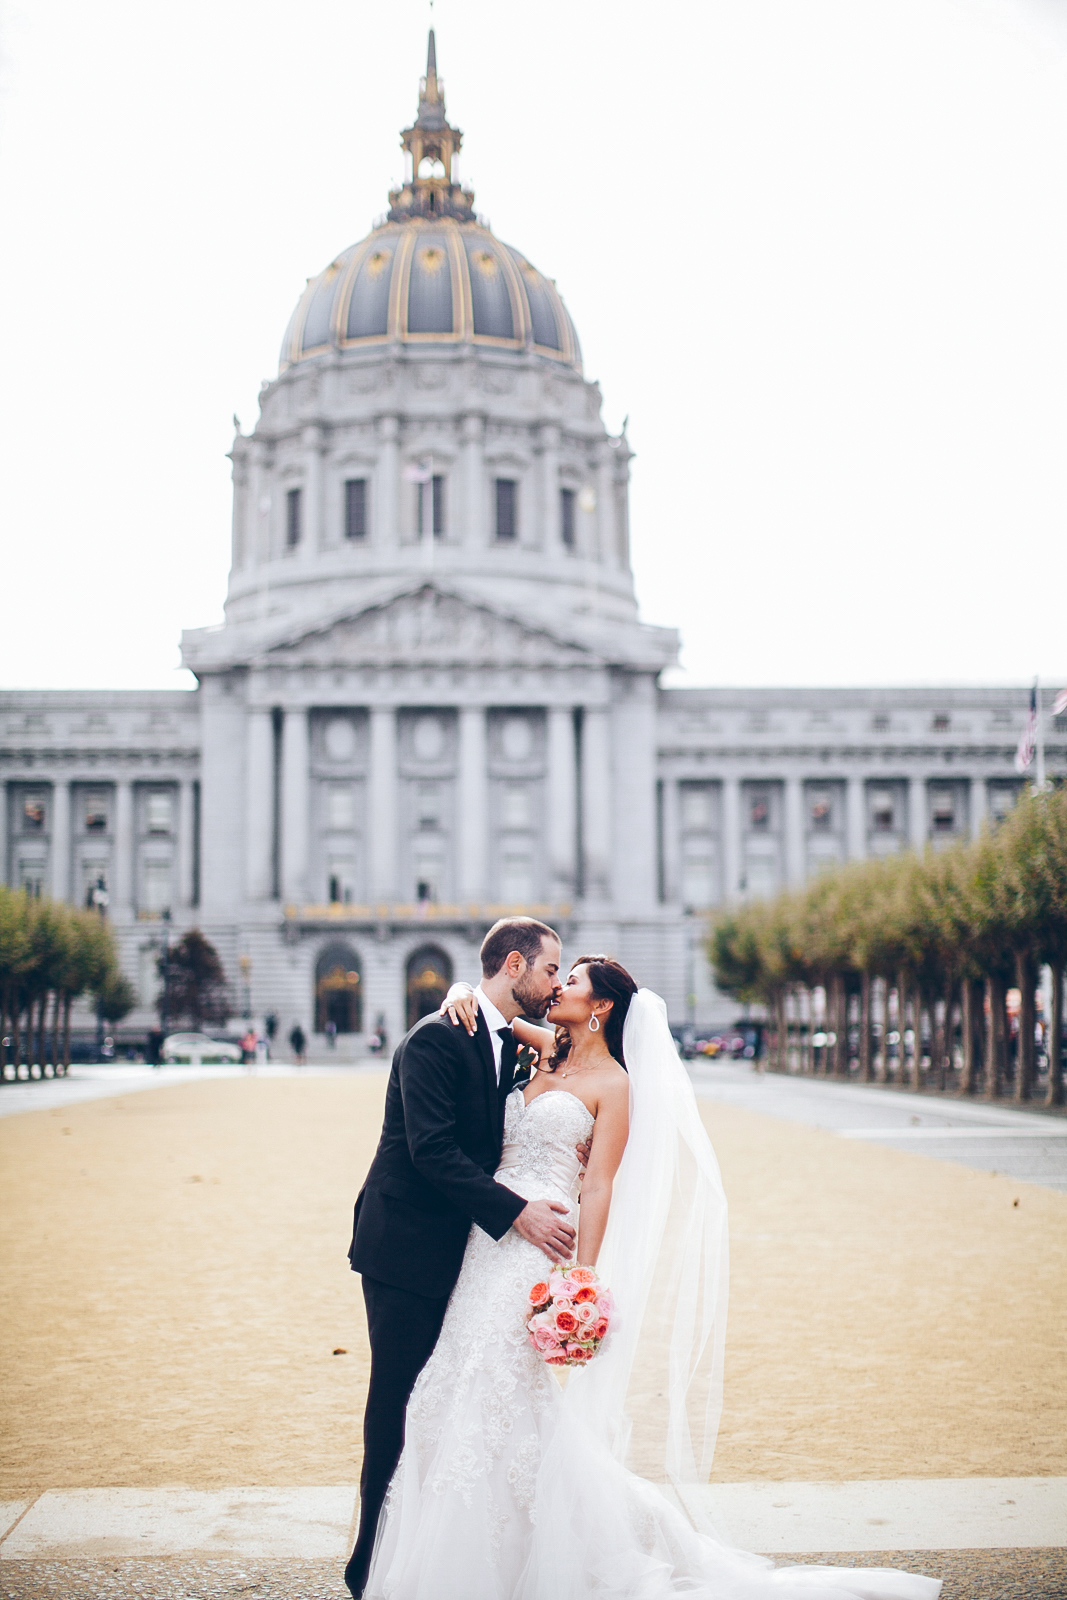 San_francisco_city_hall_wedding_photography_meegan_travis_ebony_siovhan_bokeh_photography_64.jpg